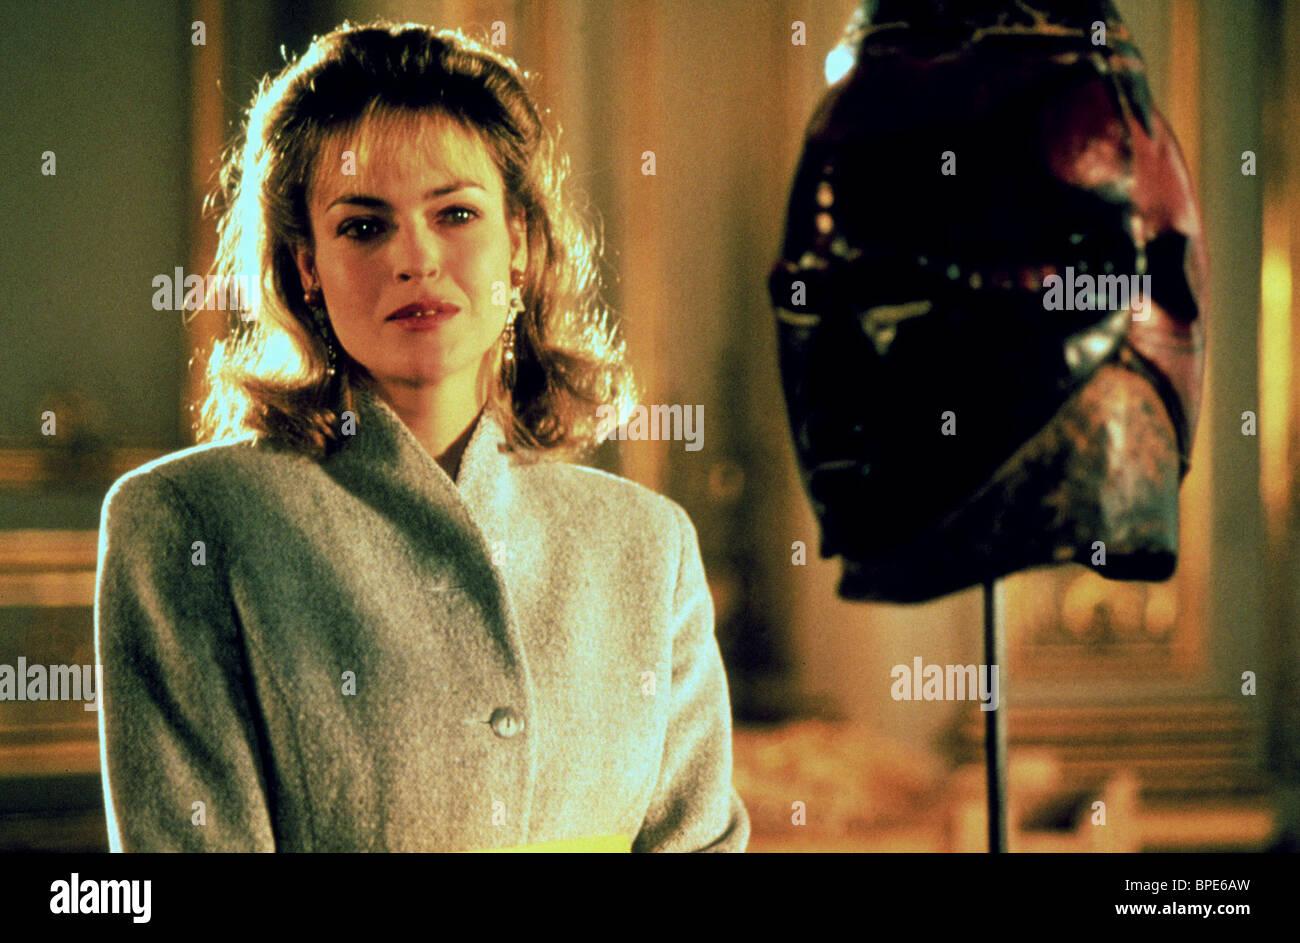 ALEXANDRA VANDERNOOT HIGHLANDER (1992) - Stock Image